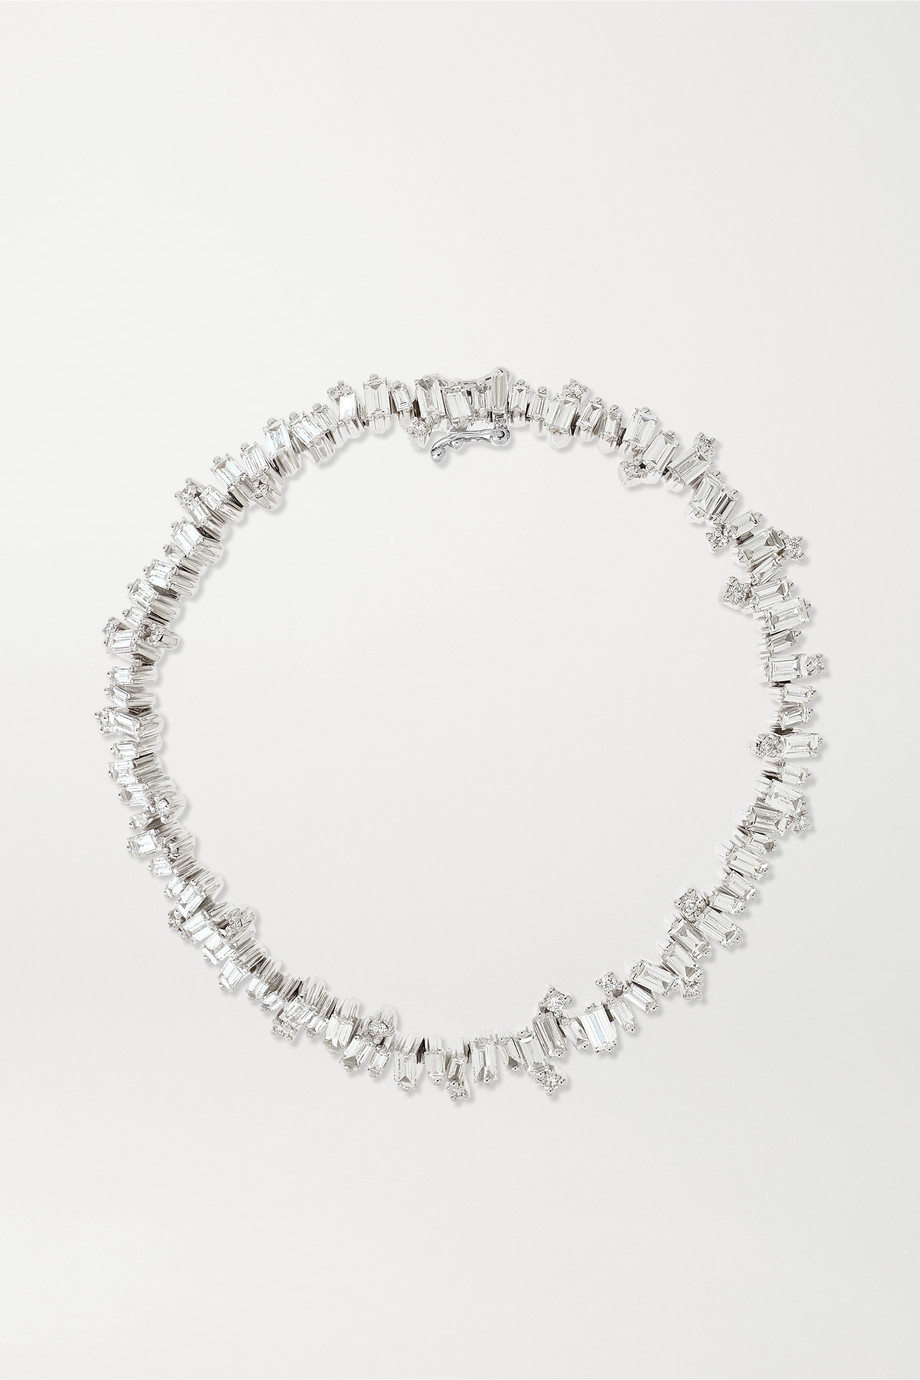 Suzanne Kalan Fireworks 18-karat white gold diamond tennis bracelet